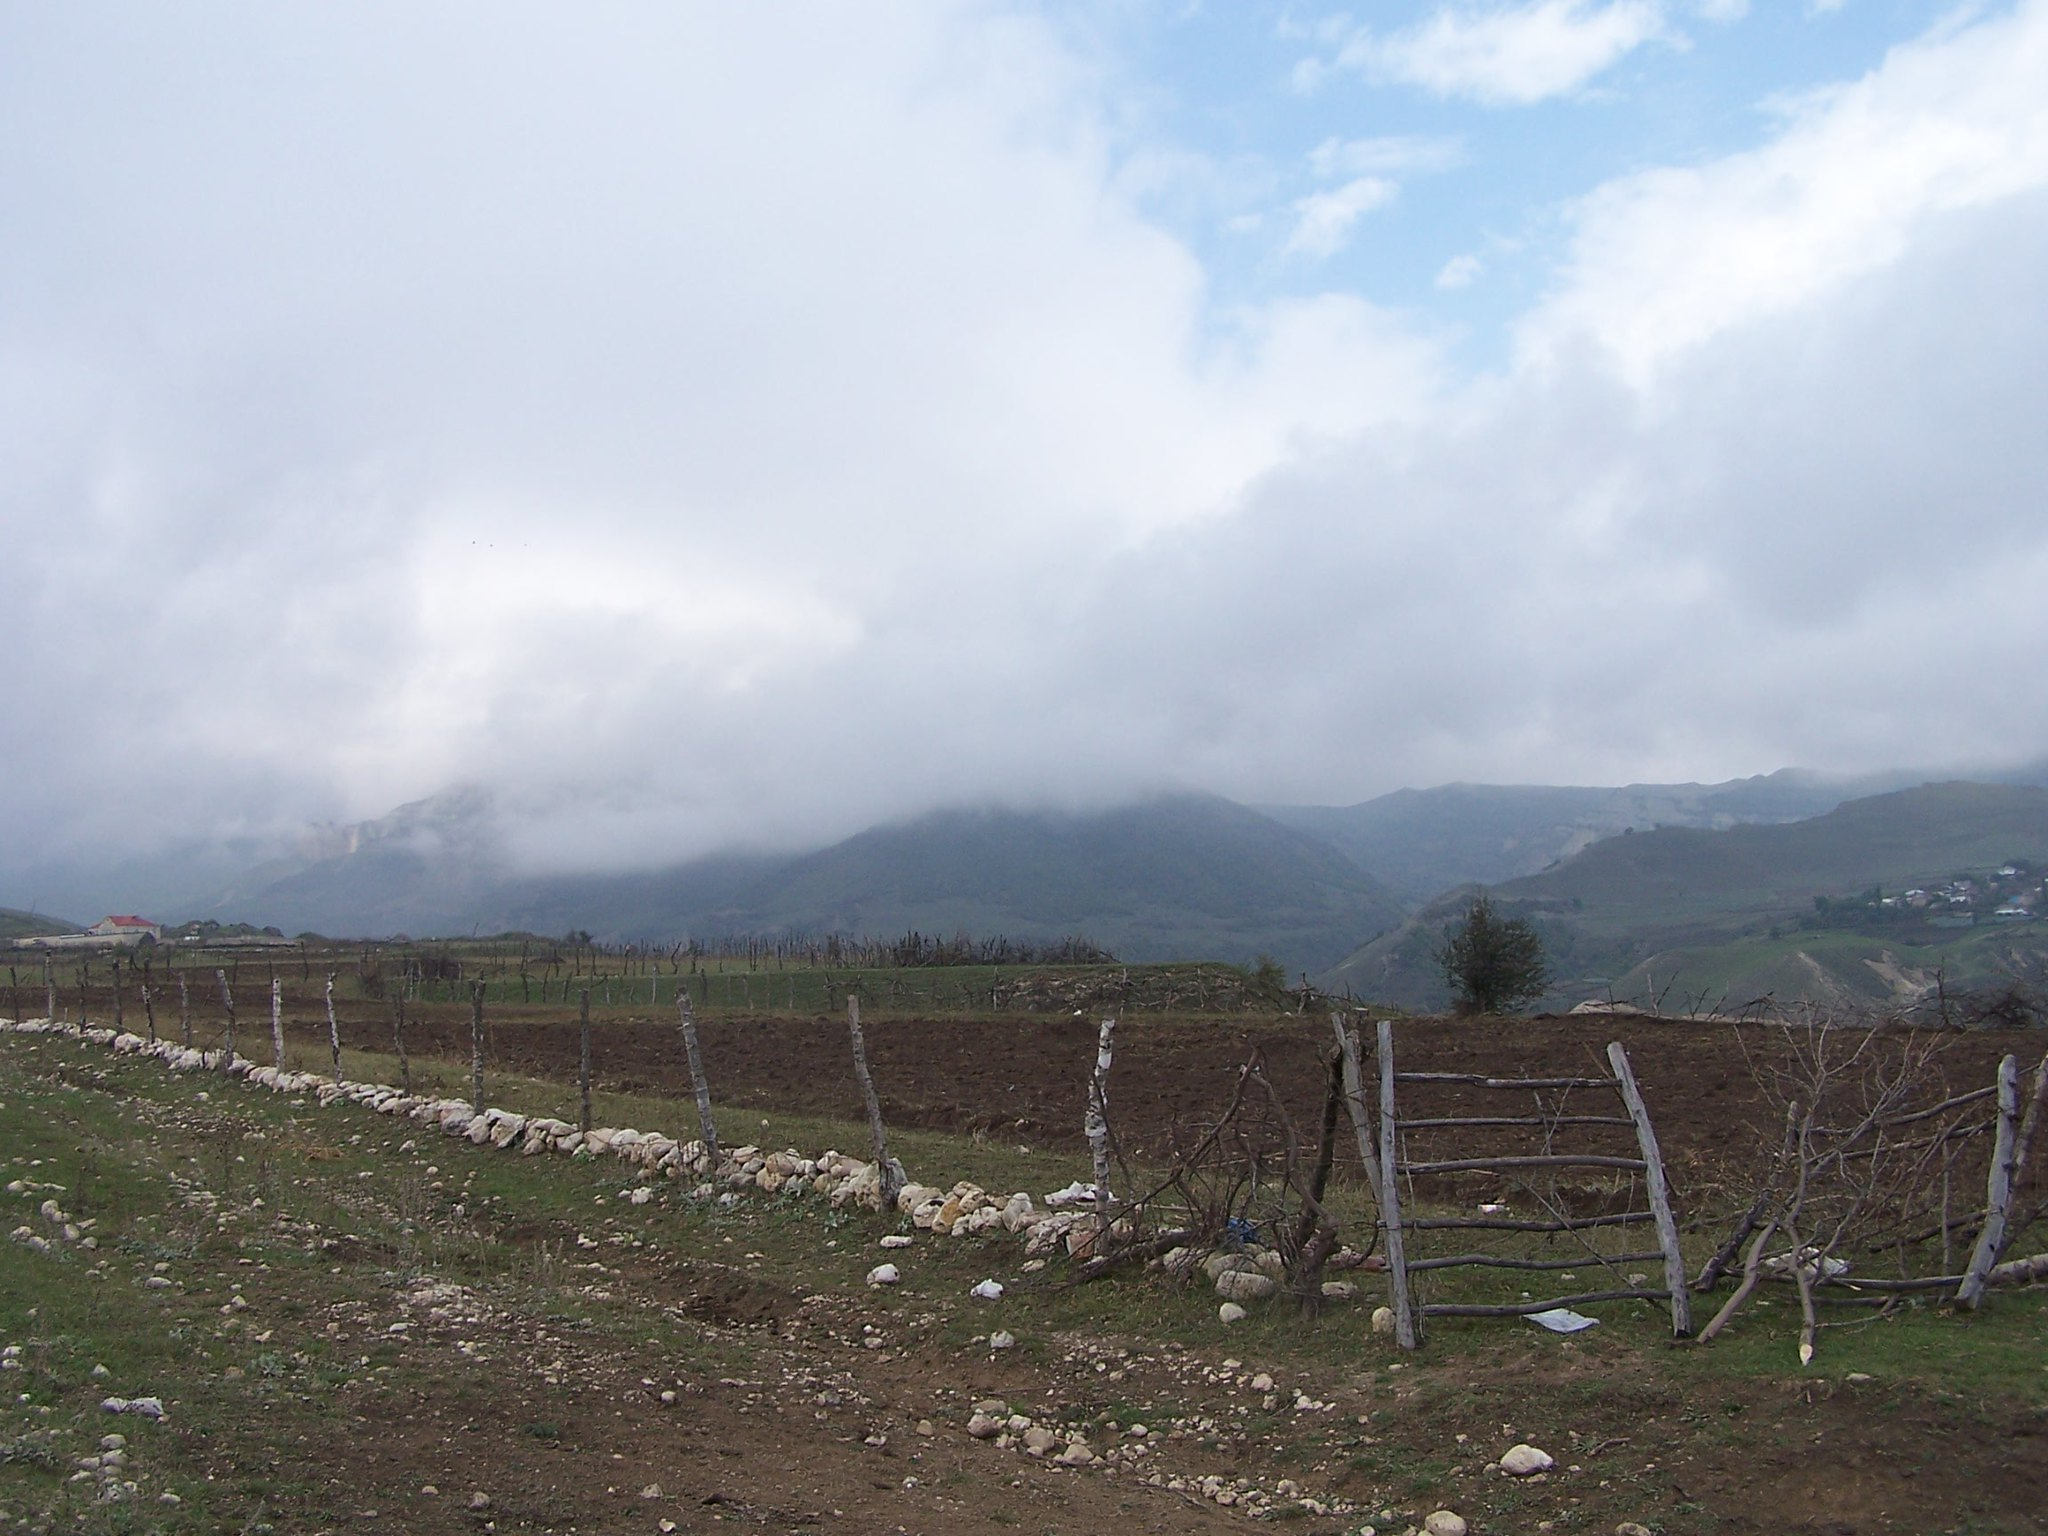 azerbaijan villaggi